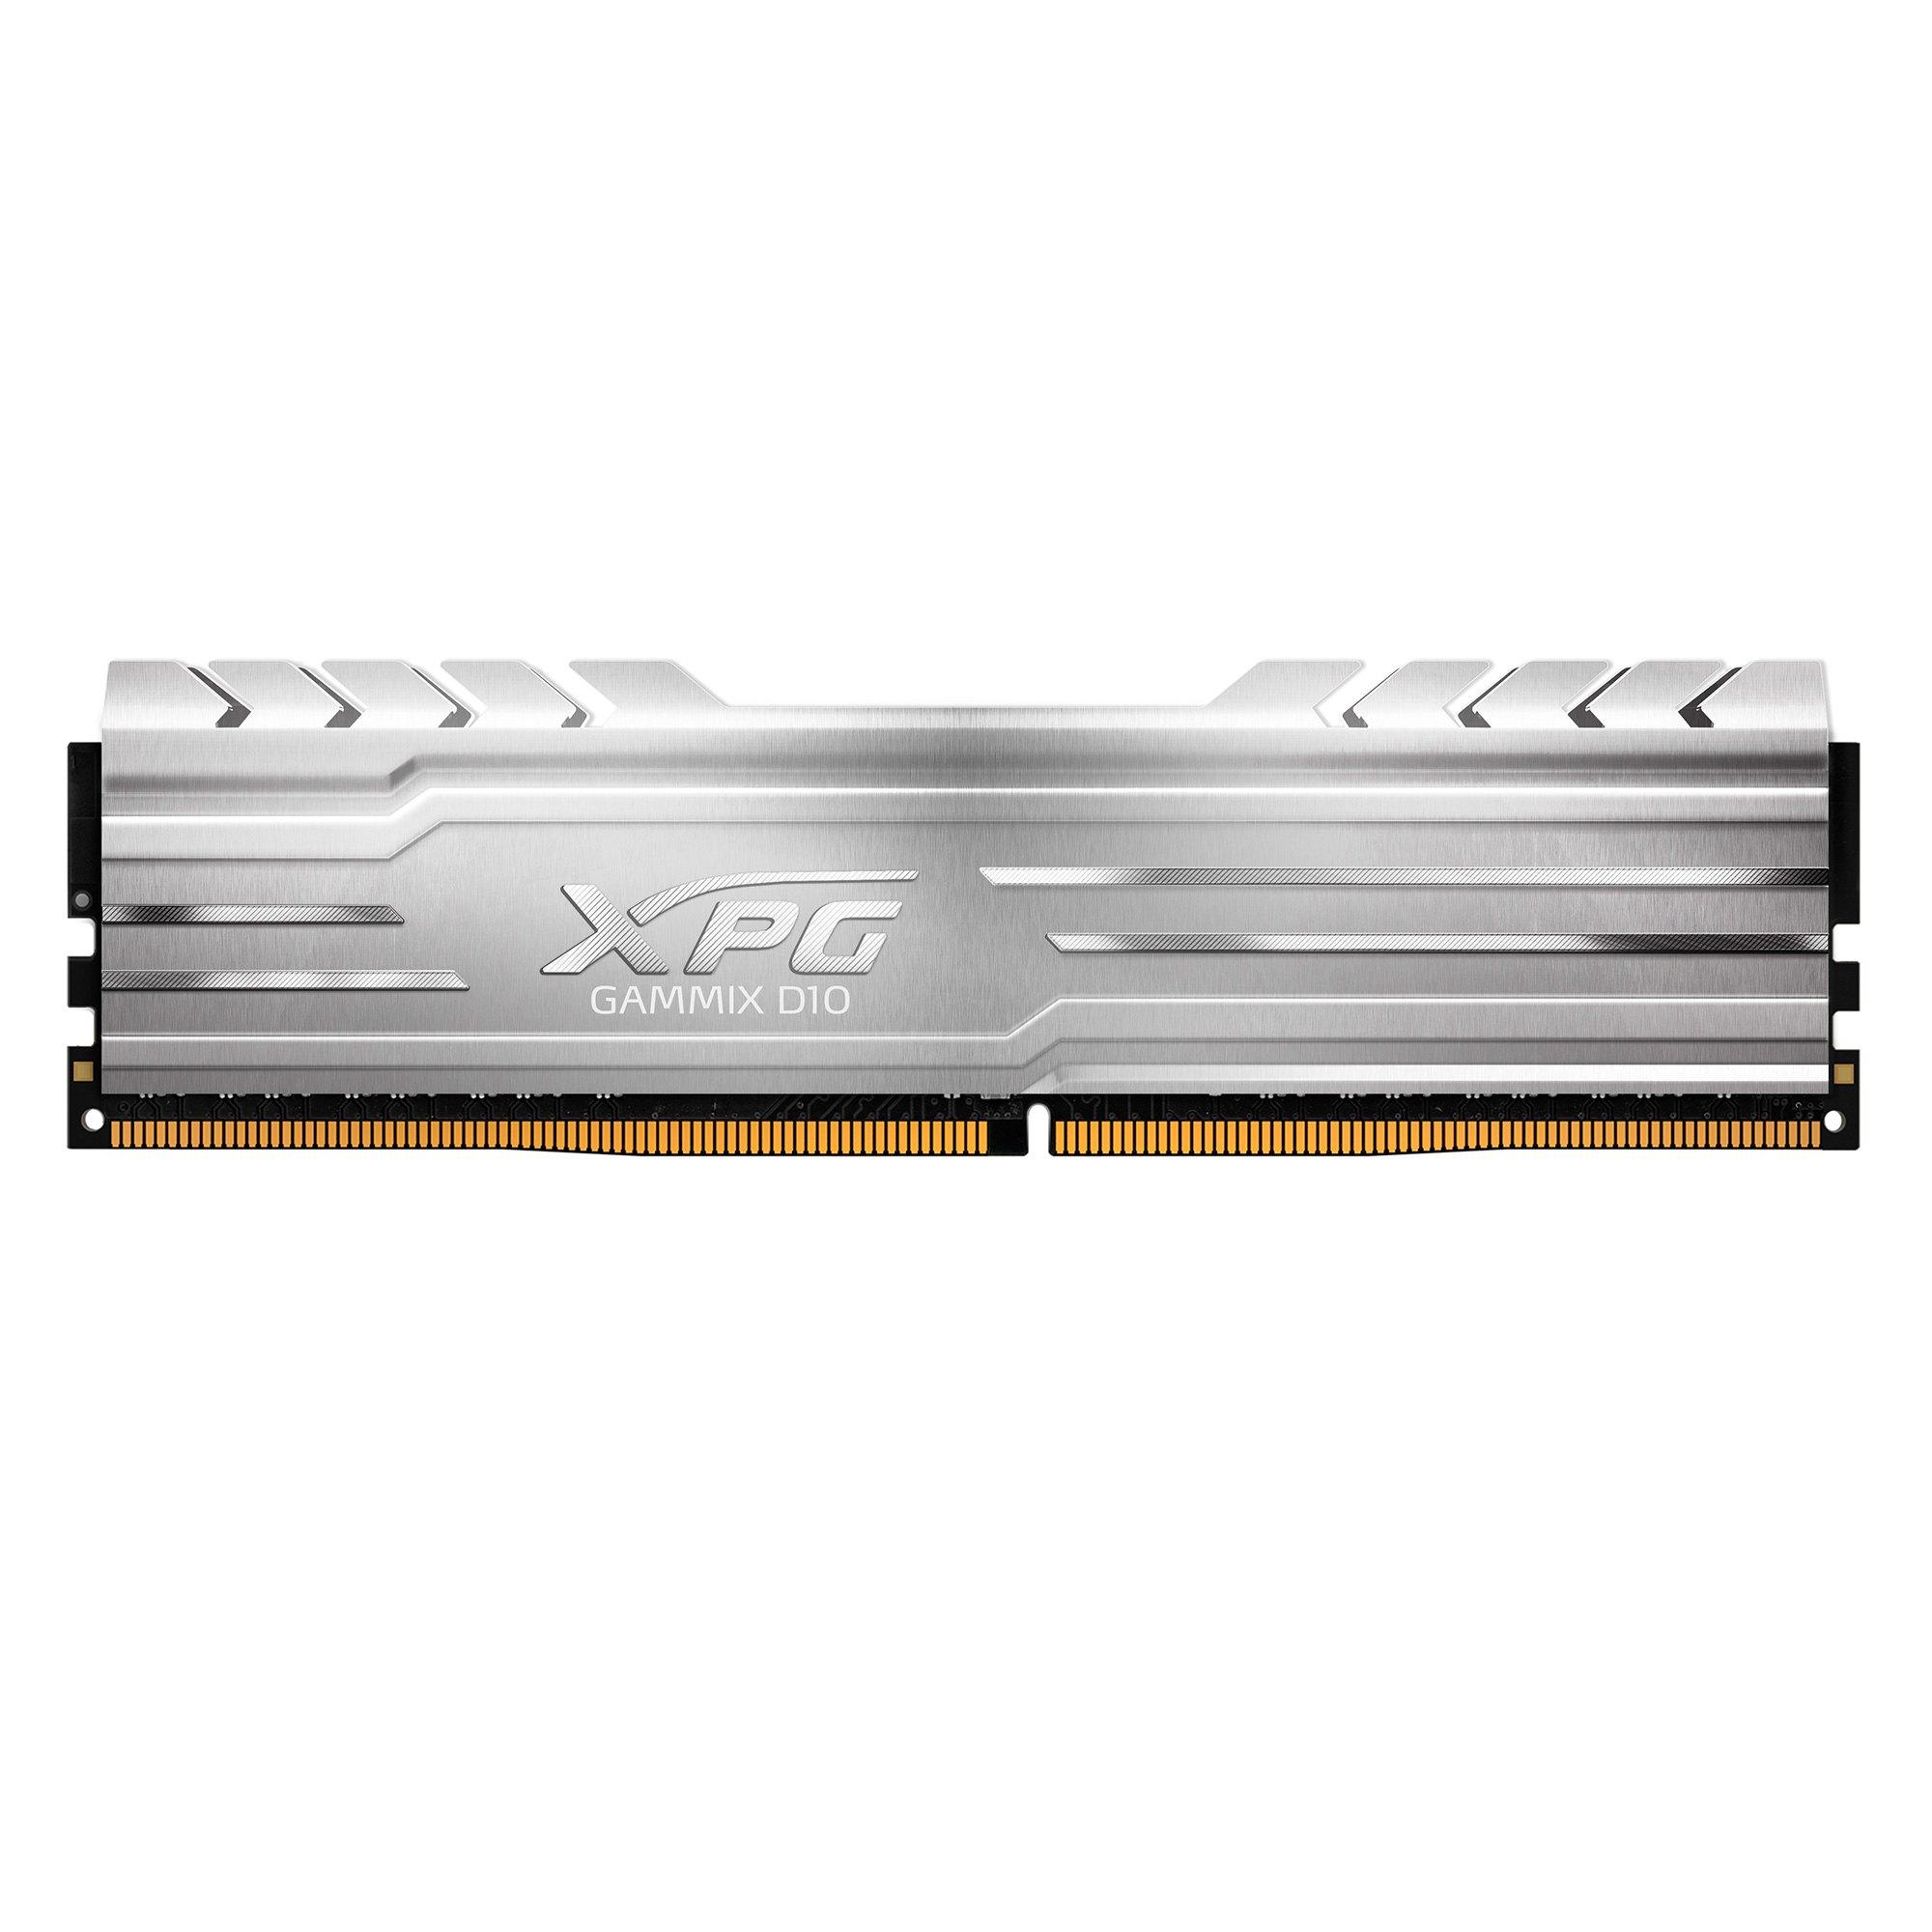 16GB (2x8GB) ADATA XPG Gammix D10 DDR4 3000MHz Memory for $59.49 AC + Free Shipping